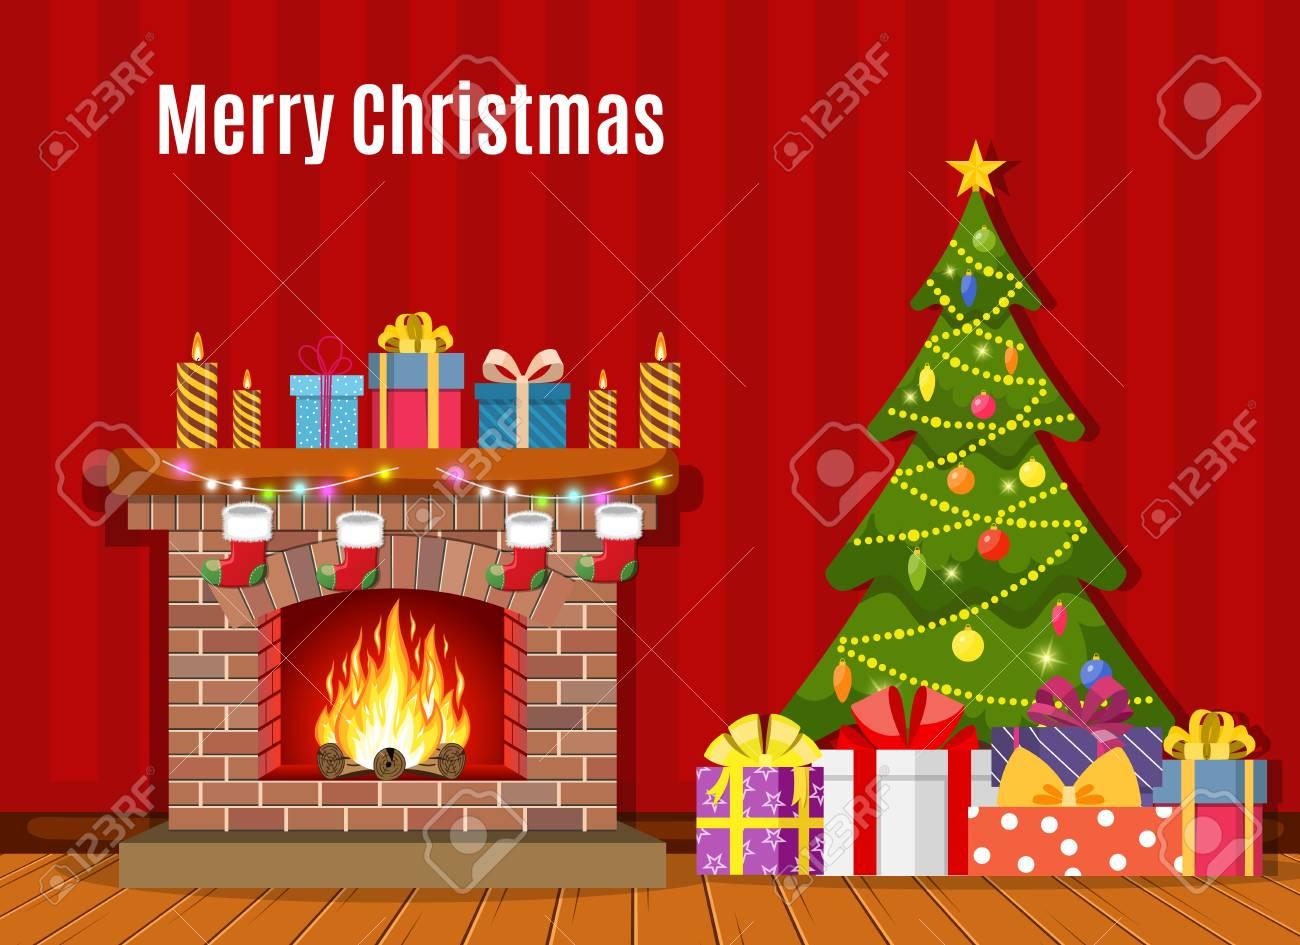 Christmas fireplace vector illustration